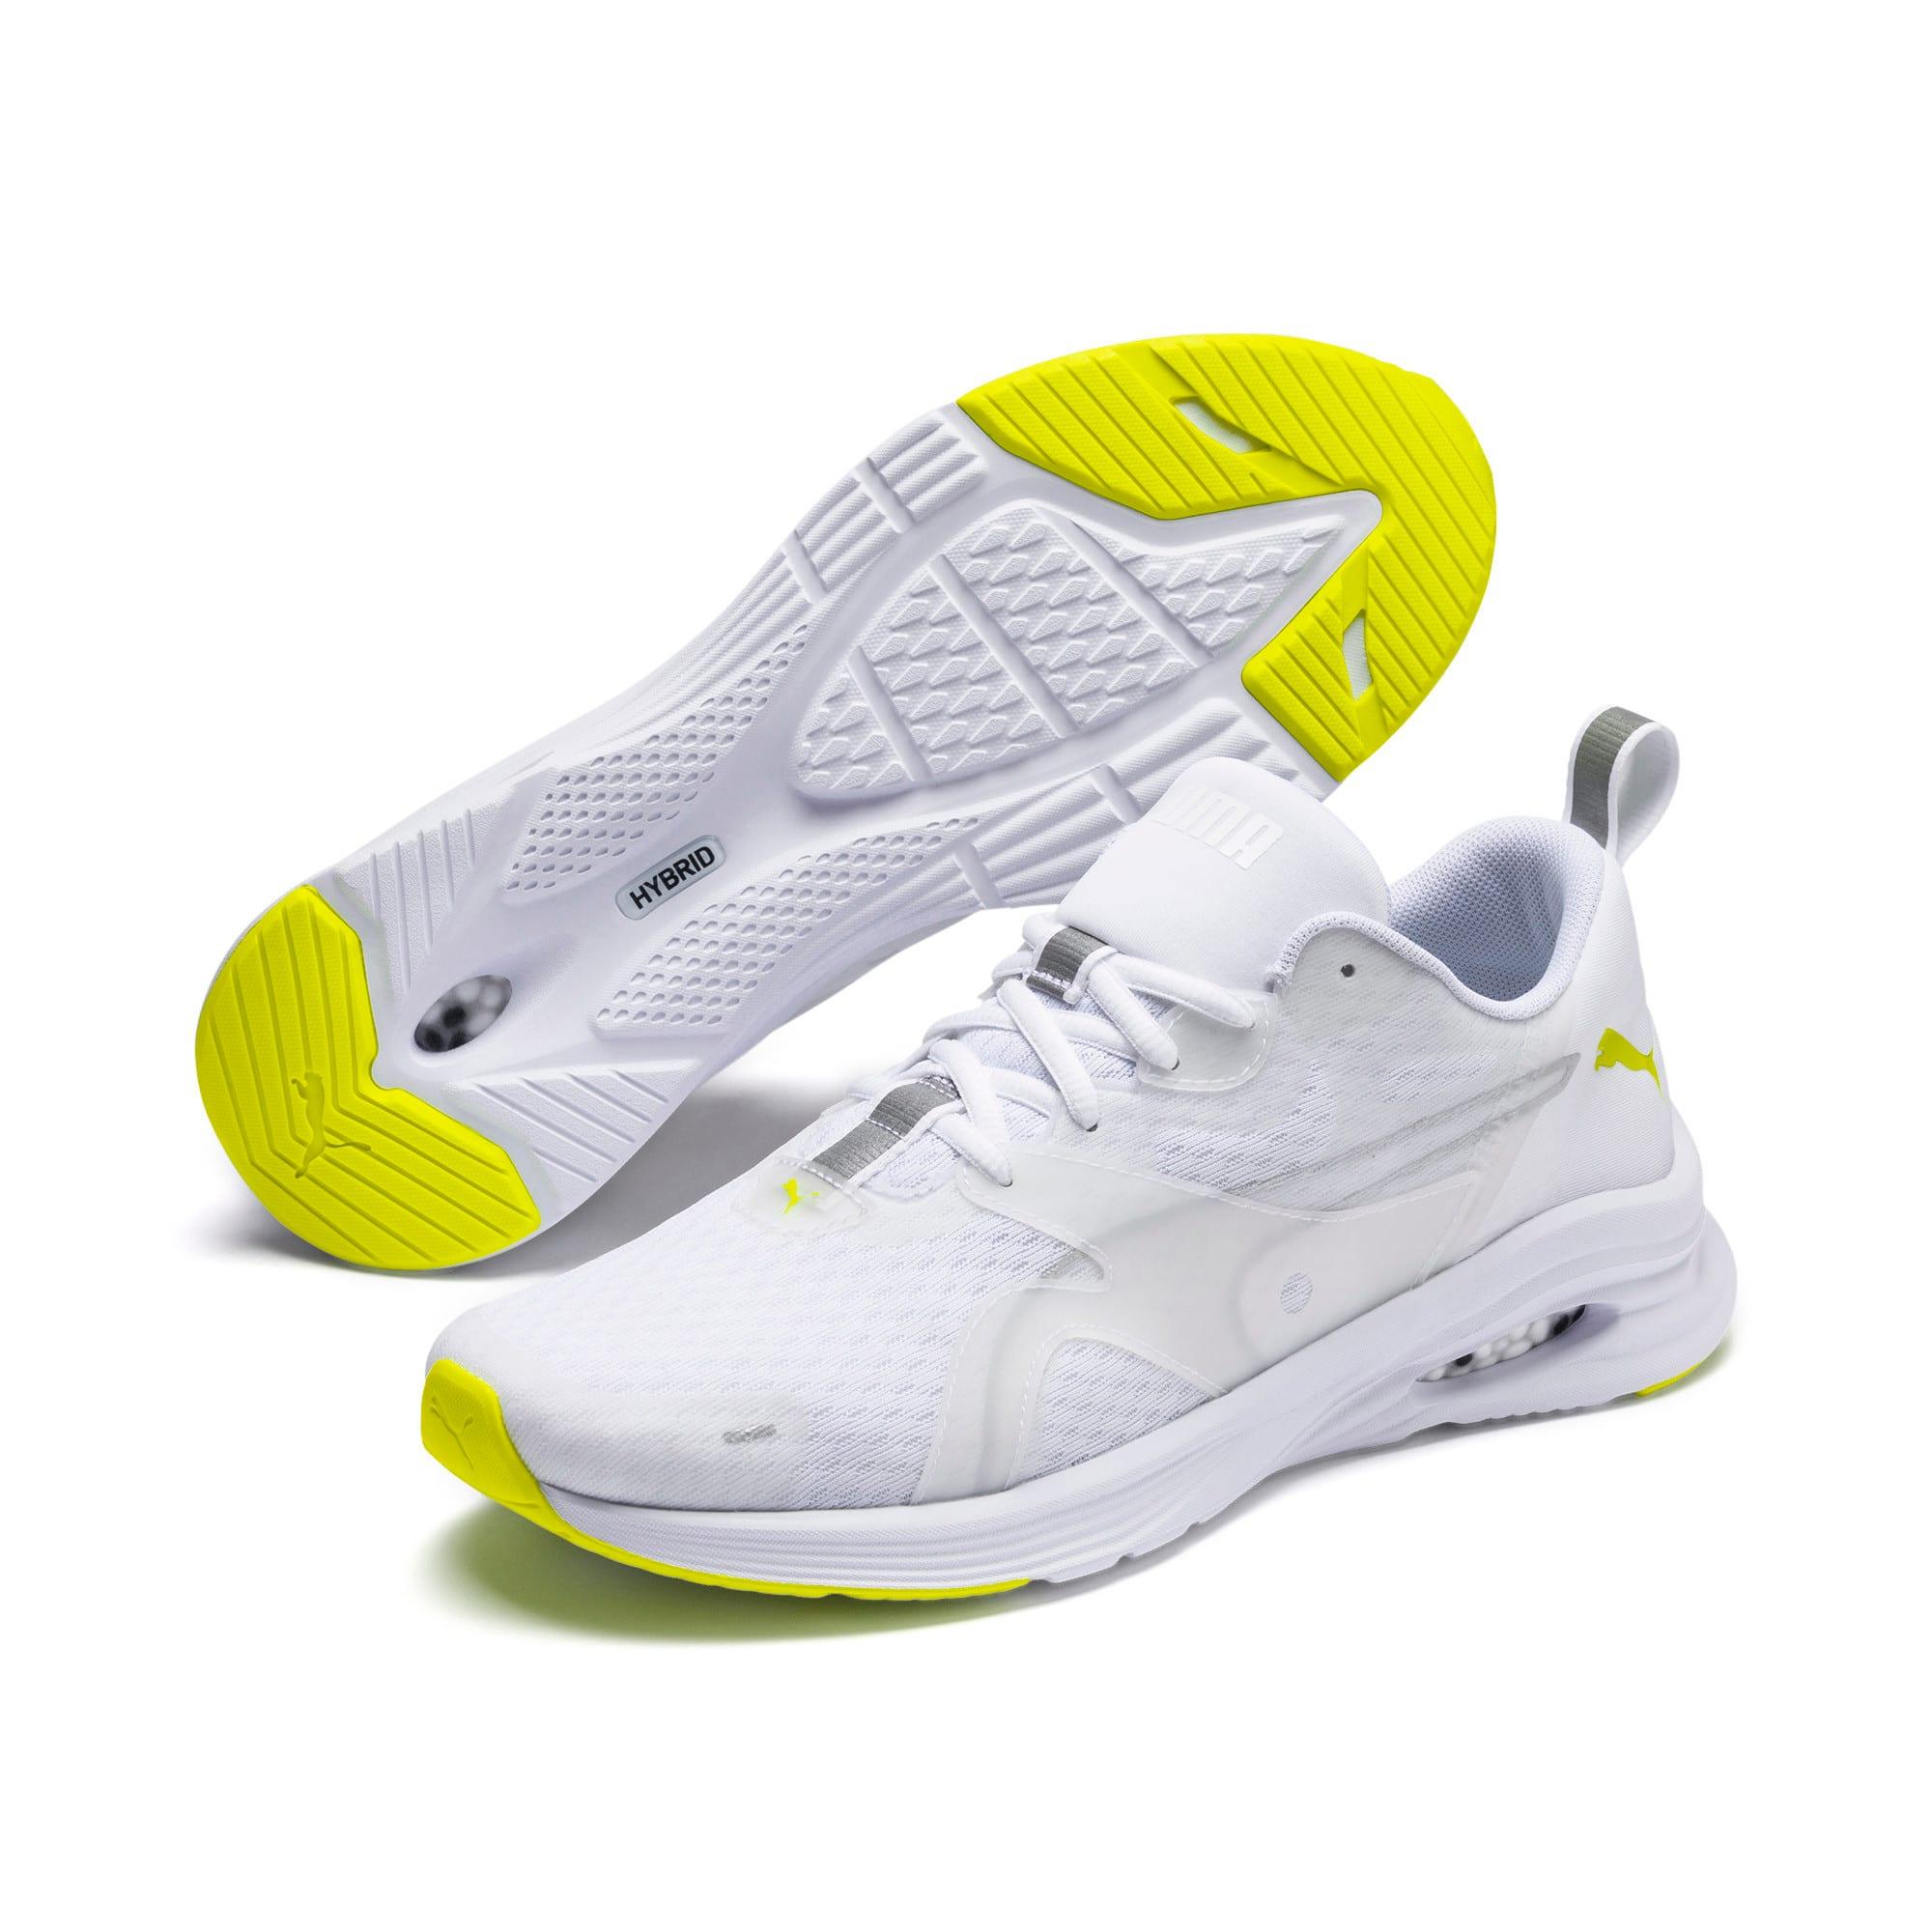 Thumbnail 3 of HYBRID Fuego Lights Men's Running Shoes, Puma White-Yellow Alert, medium